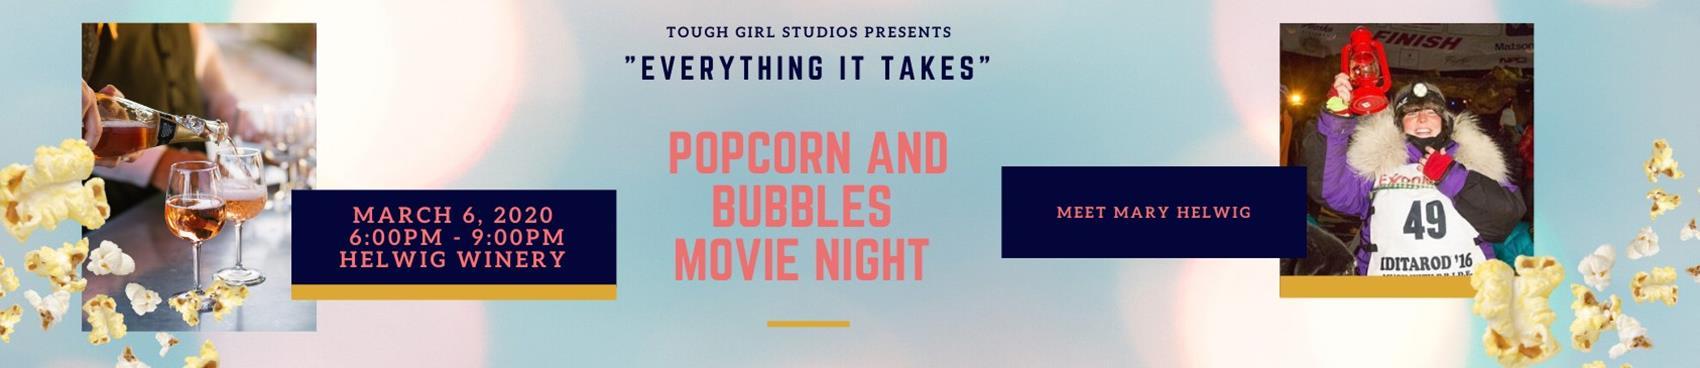 Bubbles and Popcorn Movie Night